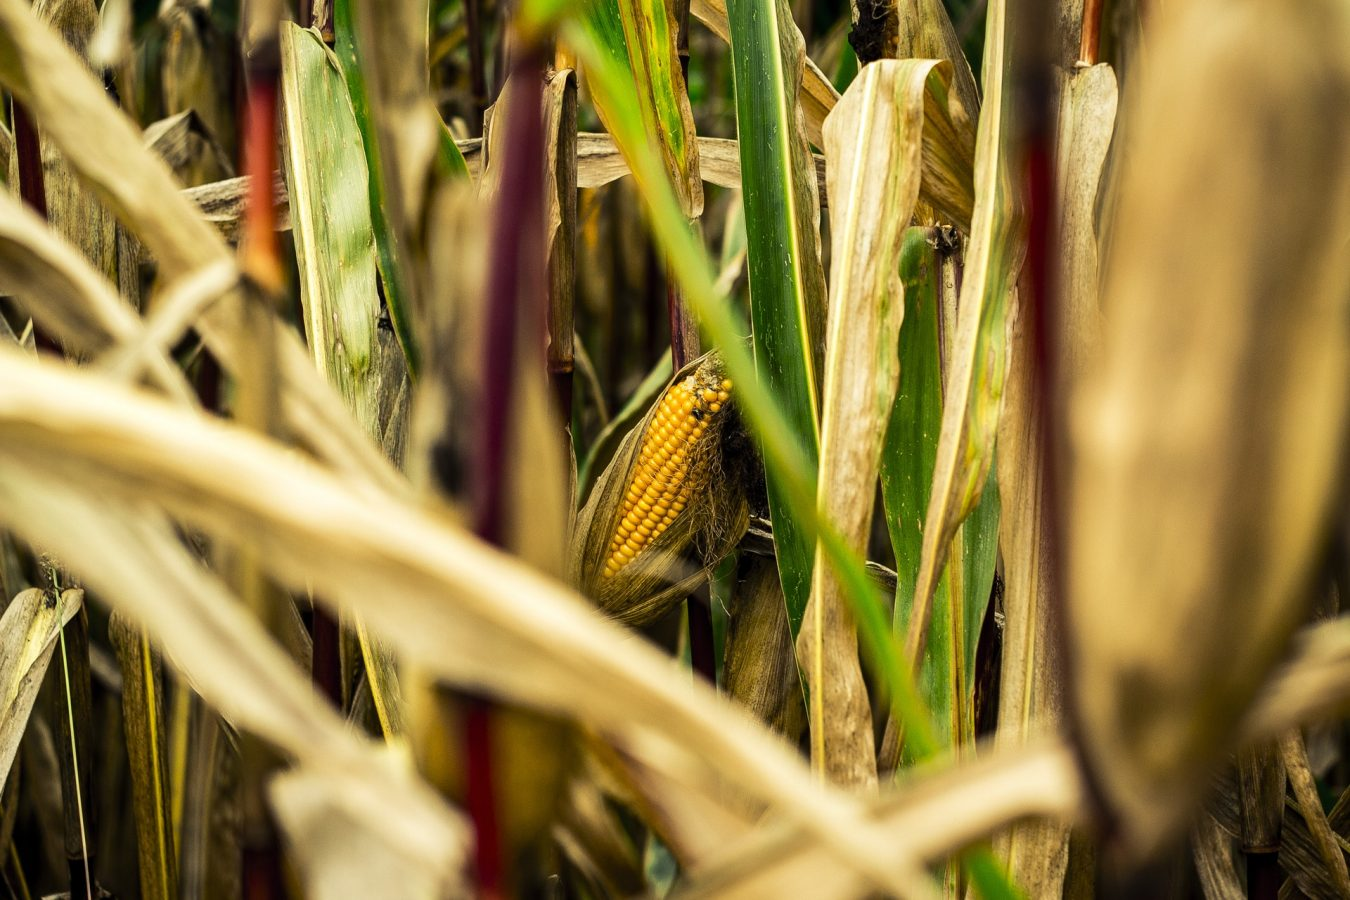 kukurydza ekologiczna uprawa